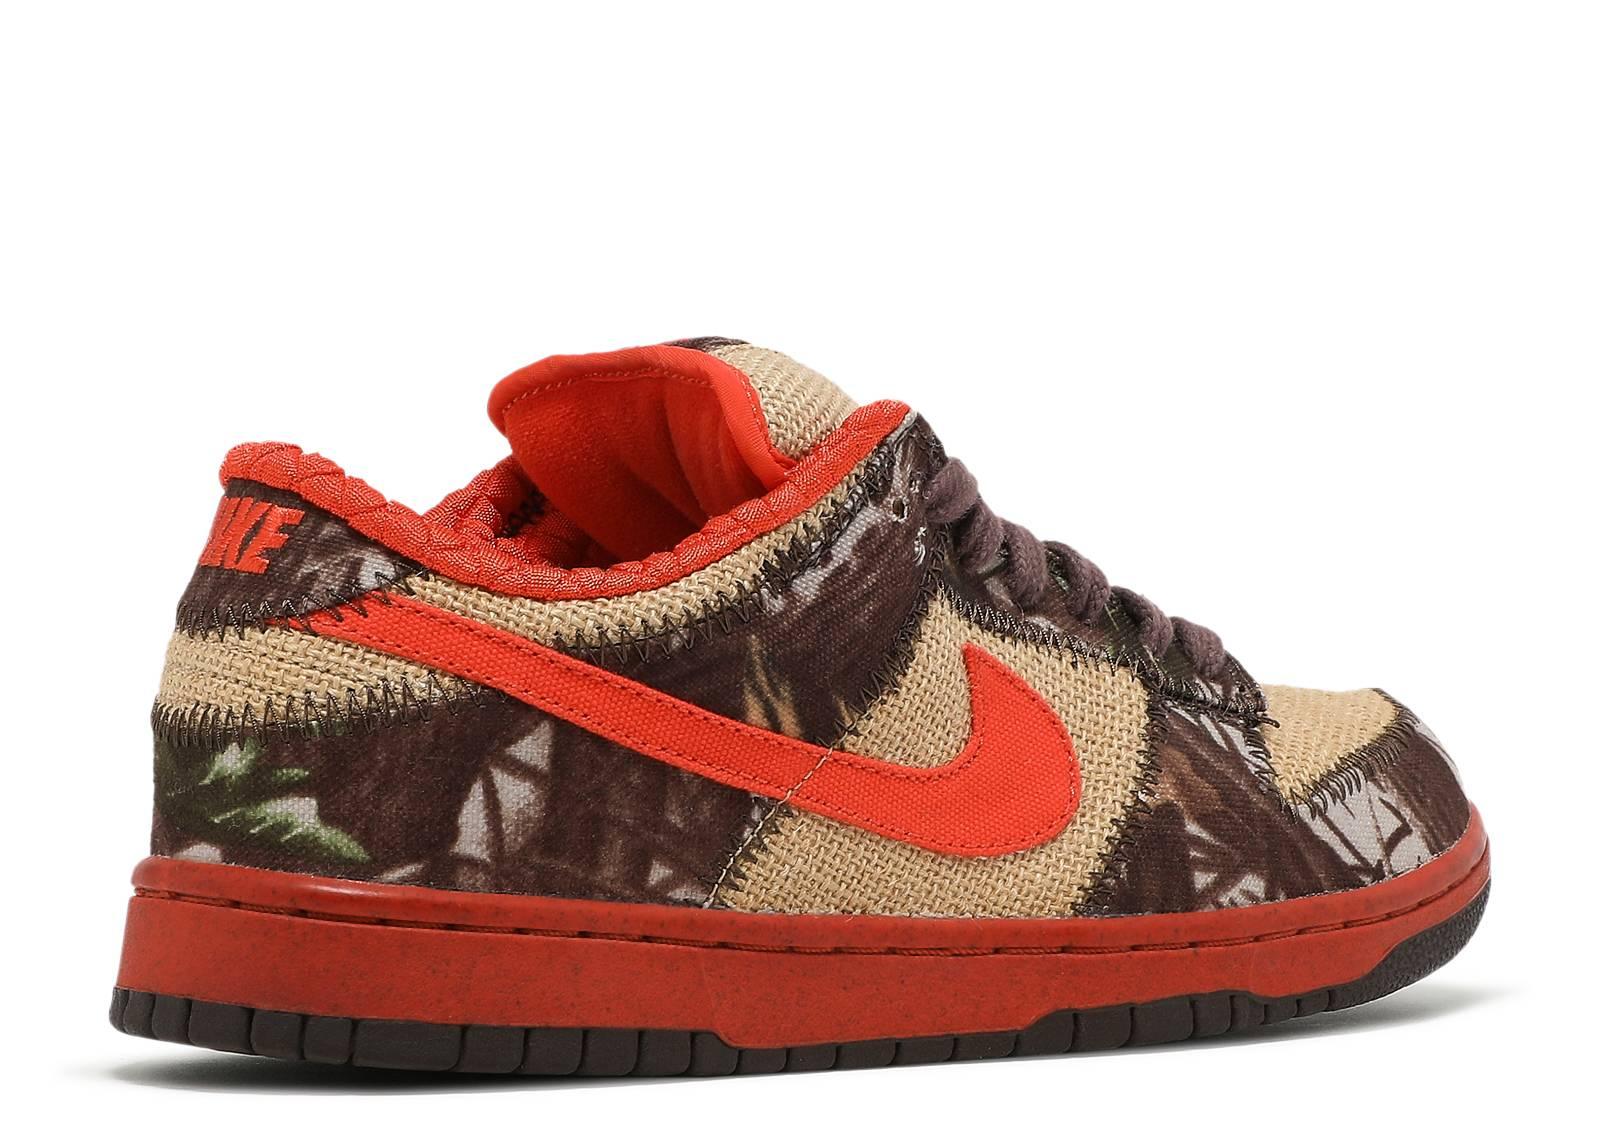 low priced 29a2b bffa0 ... dunk low pro sb 2 Nike Dunk Low Pro SB – Reese Forbes Denim ...